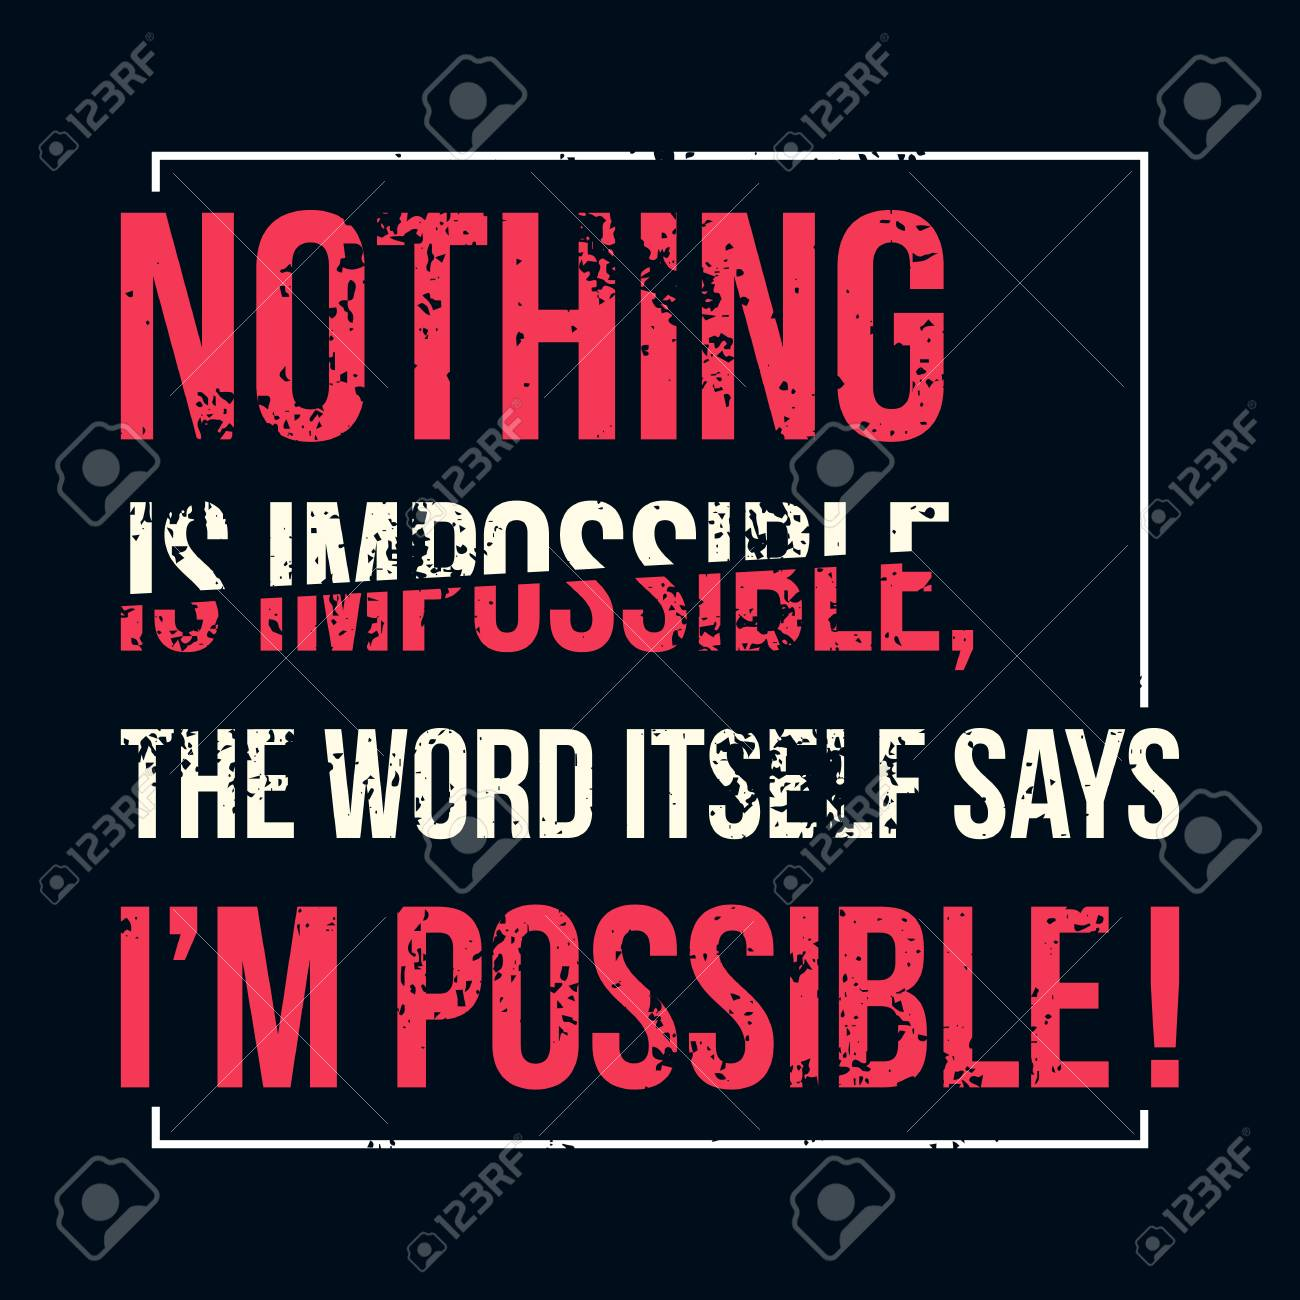 MissionStatement I AM Possible